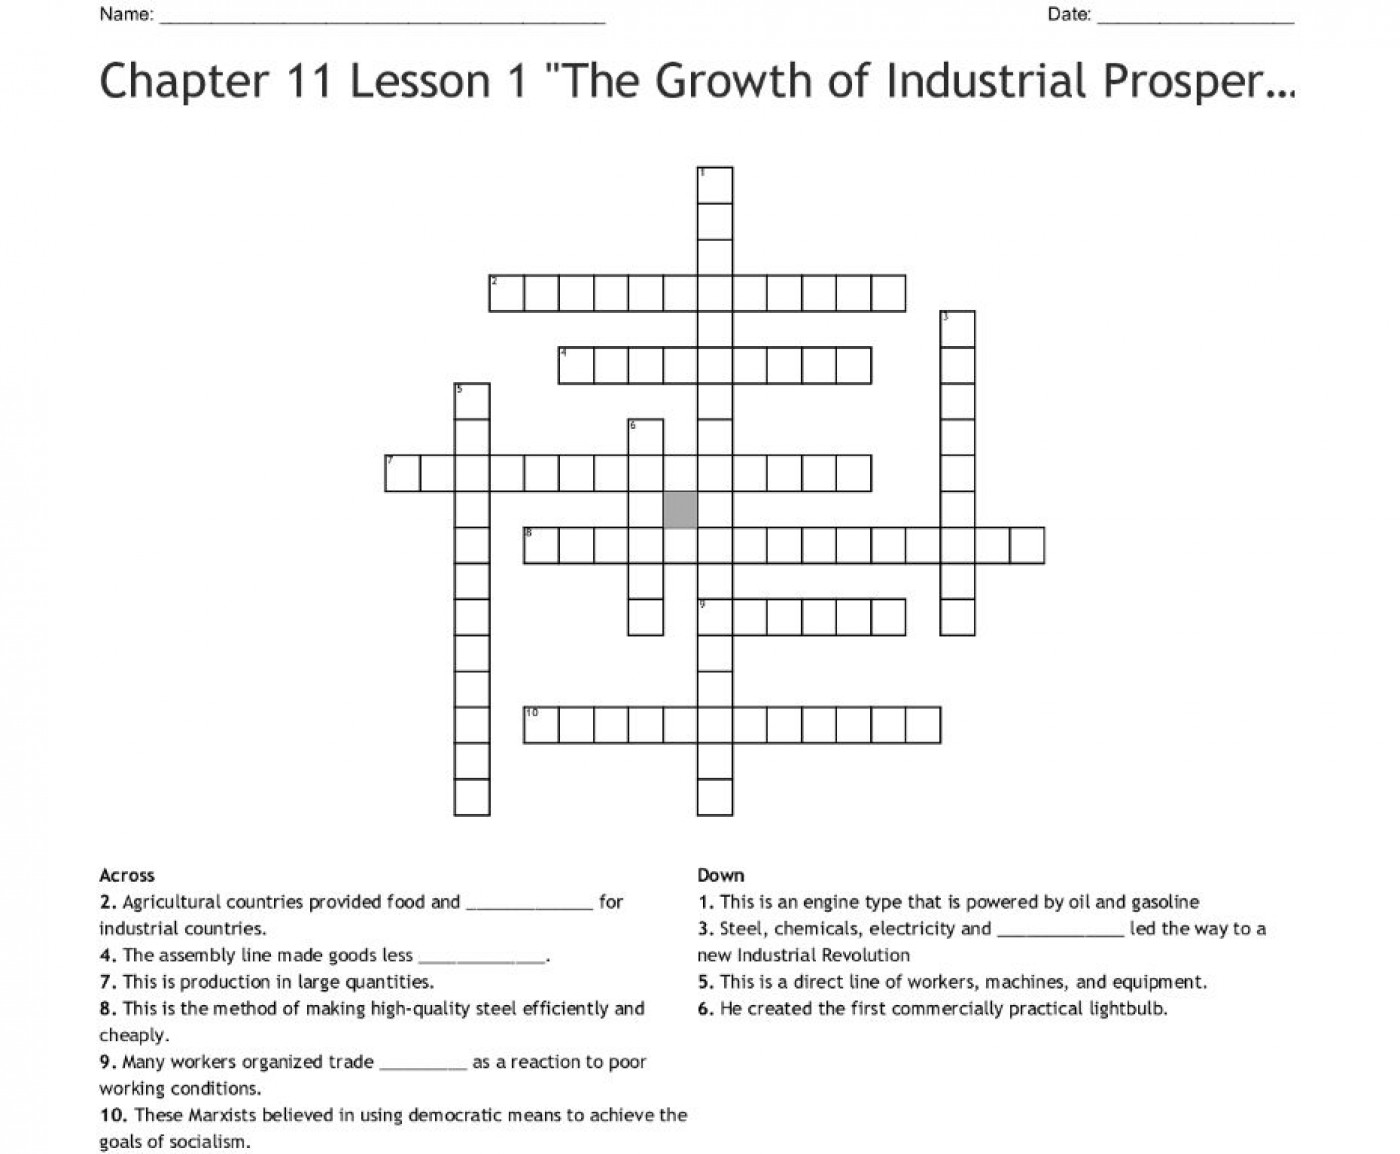 000 Unbelievable Prosperity Crossword Design  Hollow Sound Of Sudden Clue Material 7 Letter1400